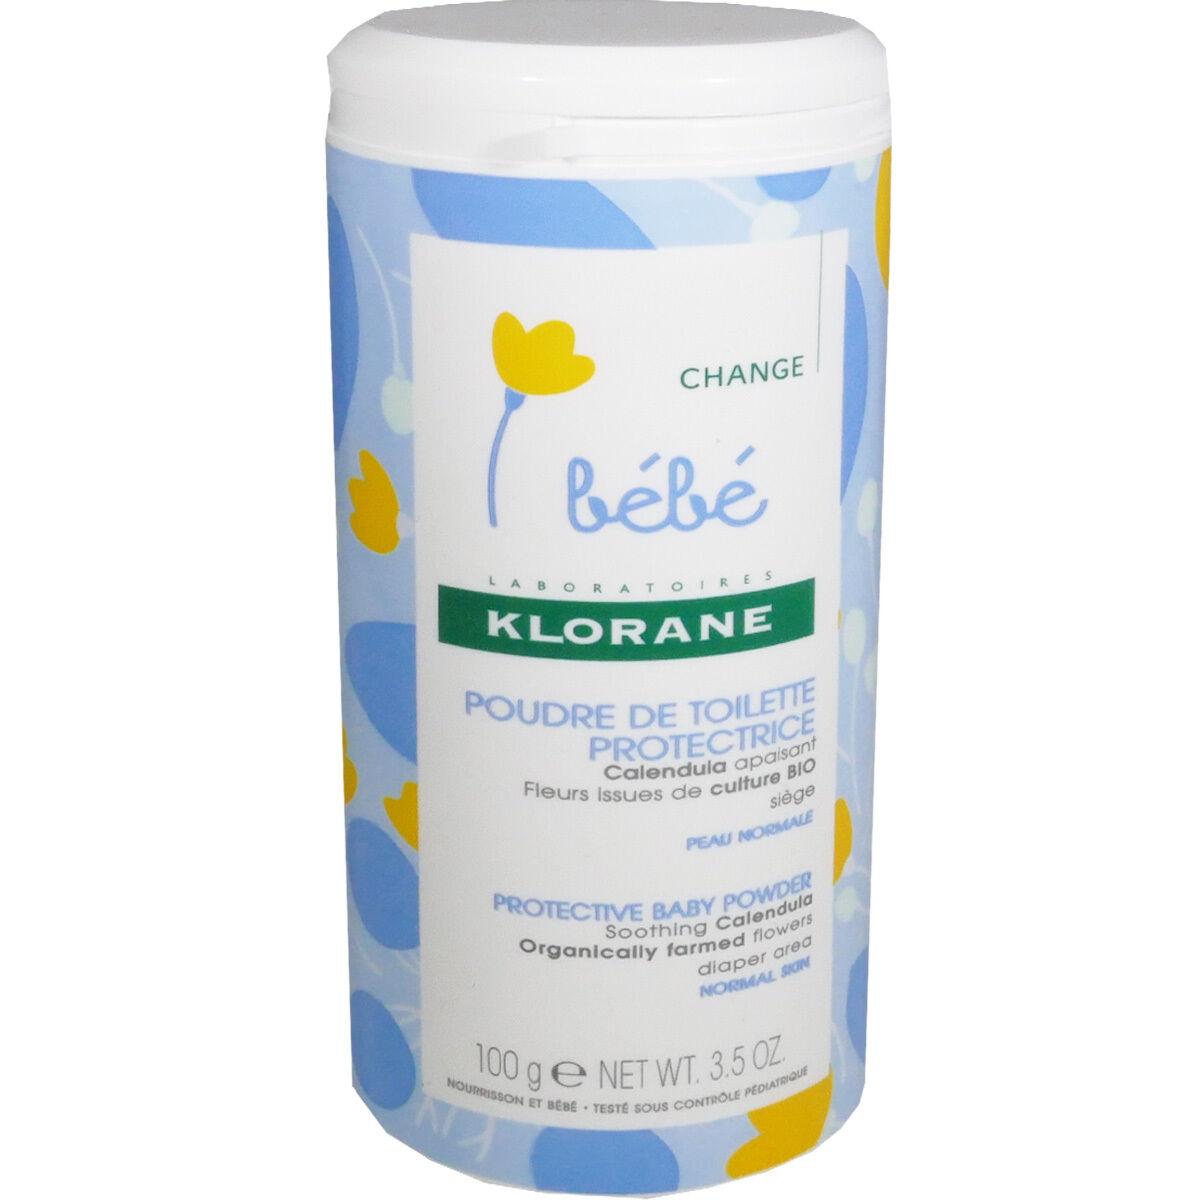 Klorane poudre de toilette protectrice 100 g change